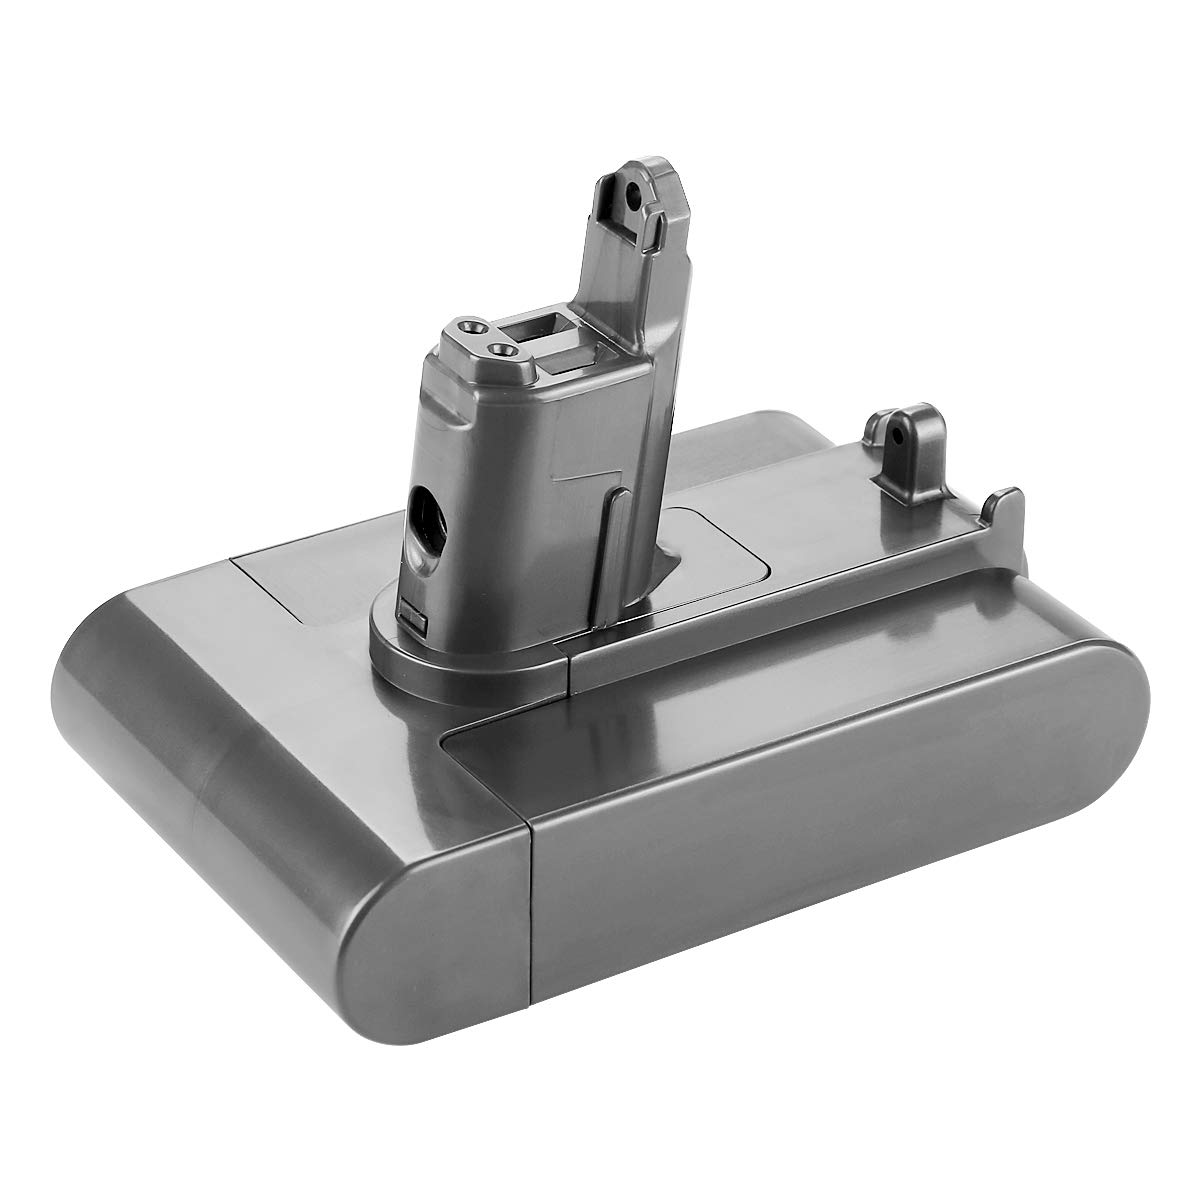 ANTRobut 22.2V 2000mAh (Only Fit Type B) DC44 Replacement Battery for Dyson DC44 DC31 DC35 DC44 DC45 Series Dyson DC44 MK2 22.2 volt Cordless Vacuum Battery